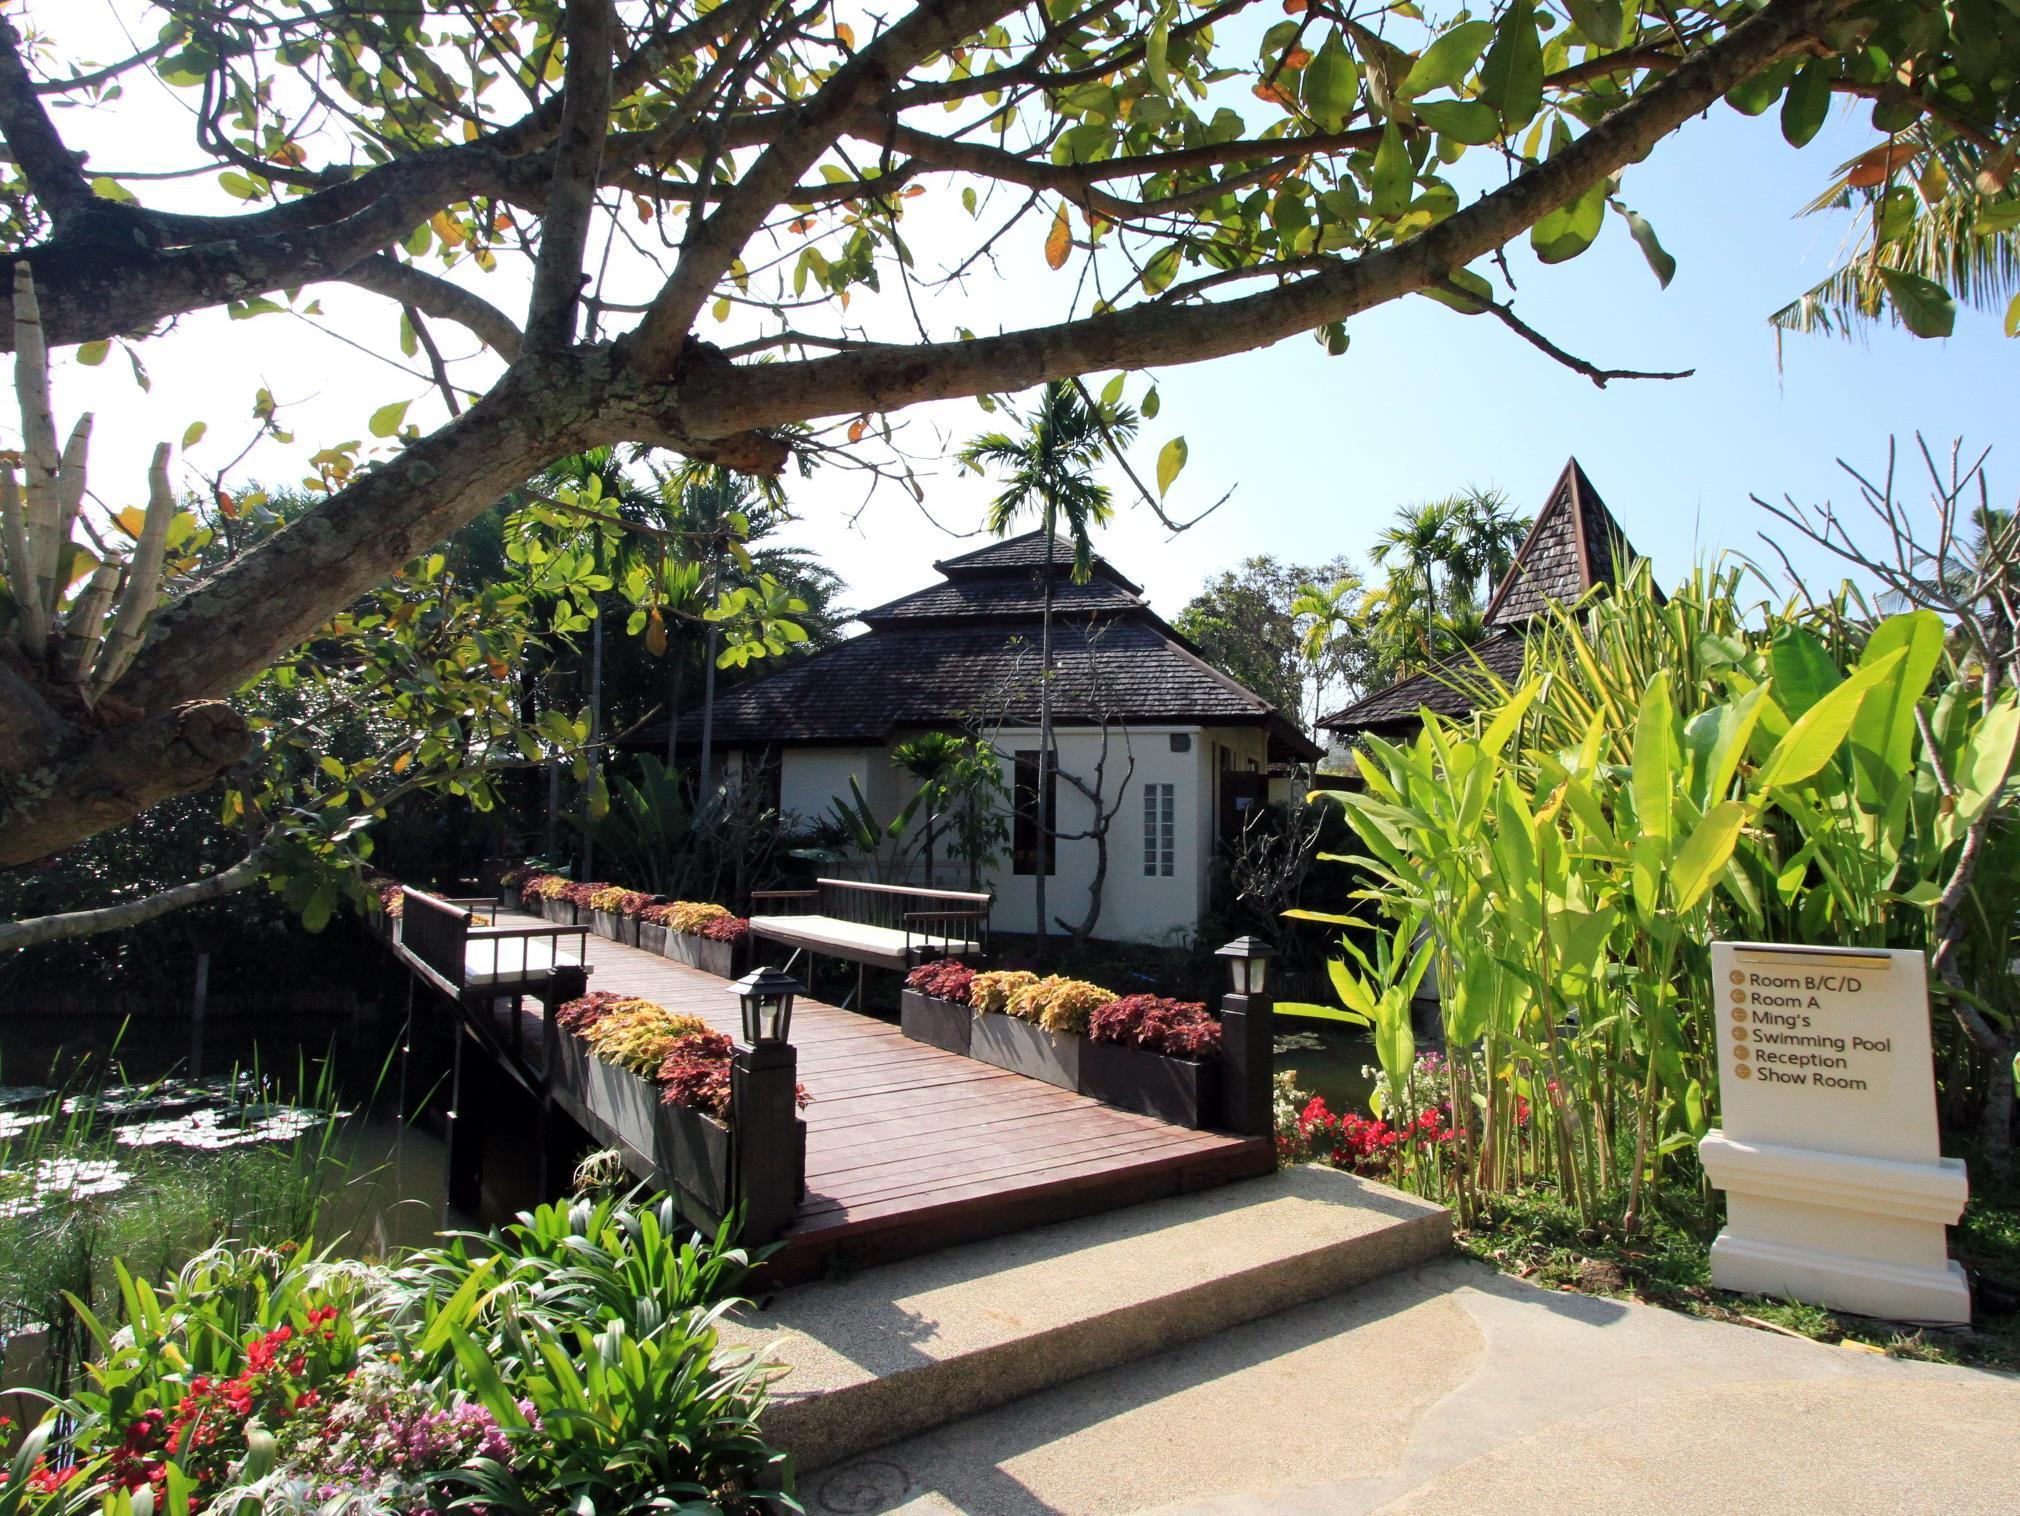 梵丽酒店·清迈兰悦度假村,Fanli Resort Chiangmai